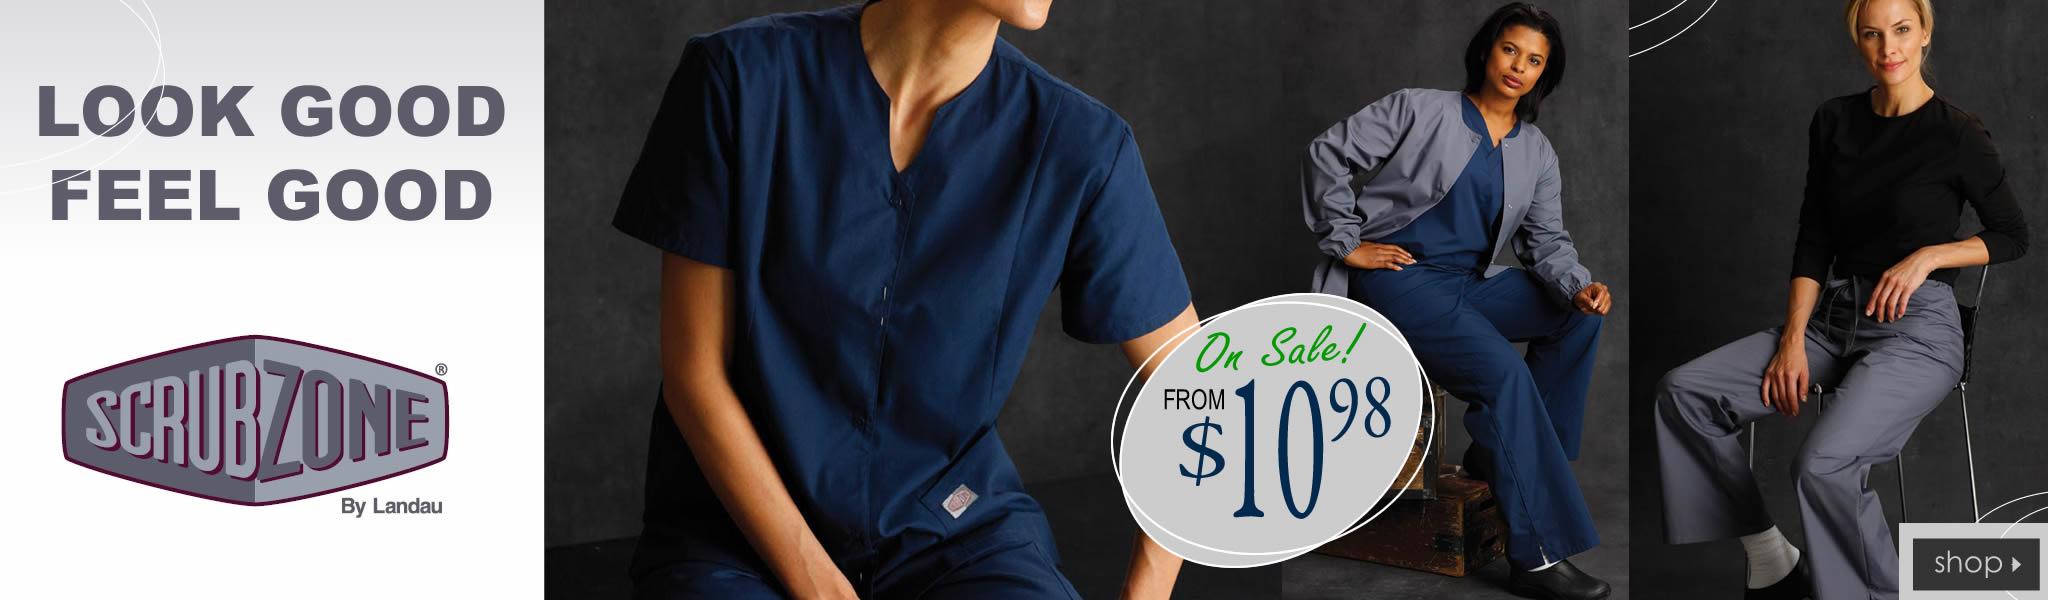 Landau Scrub Zone scrubs from $10.98 - get yours!